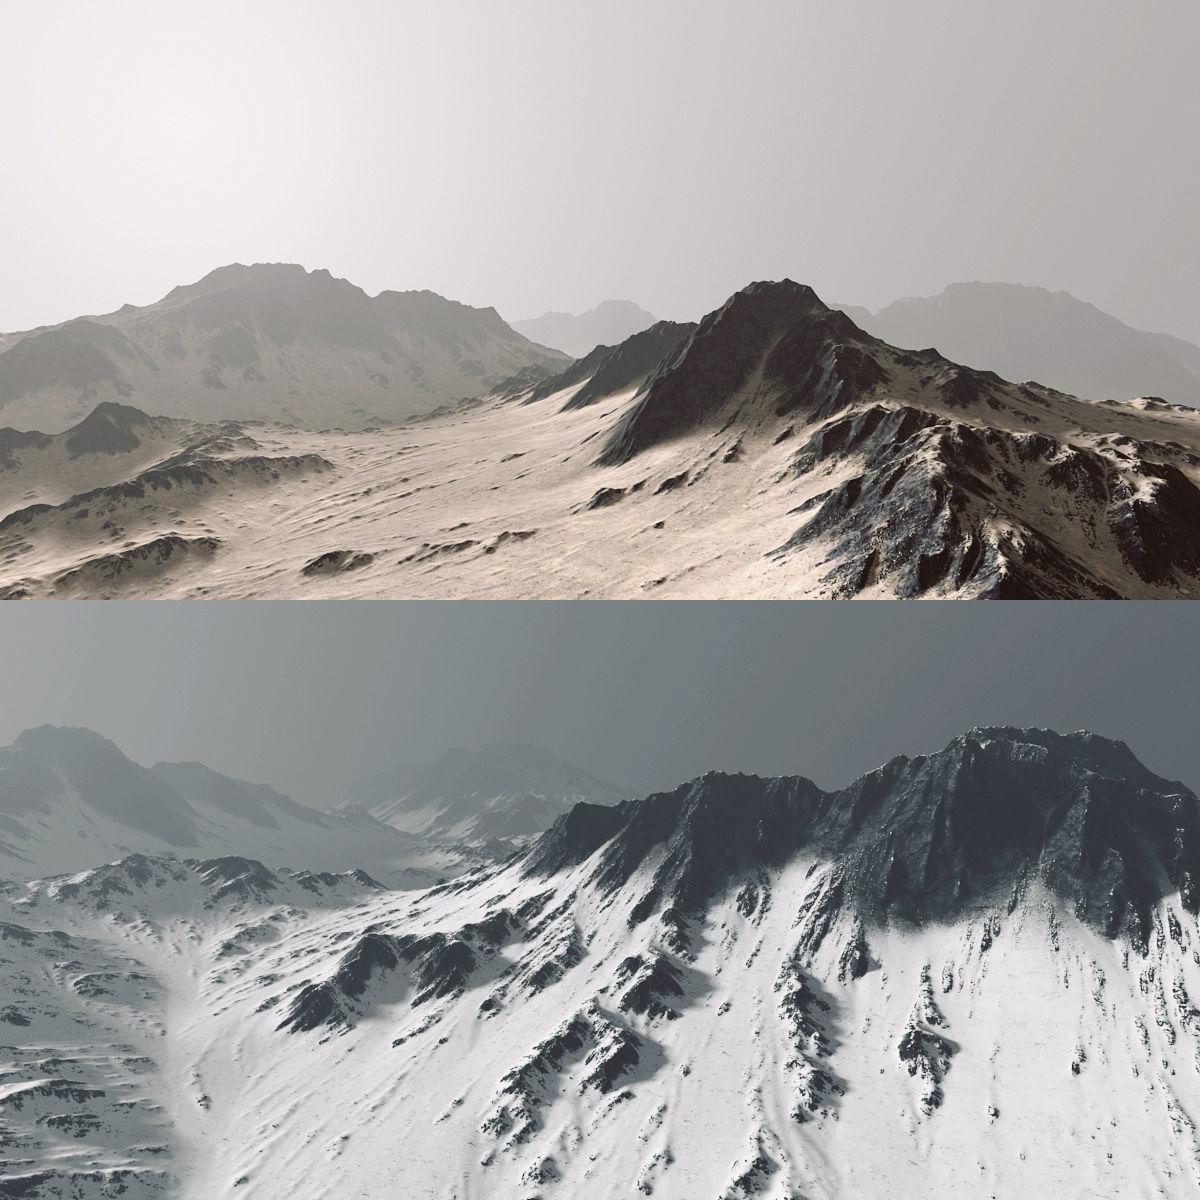 Mountains terrain